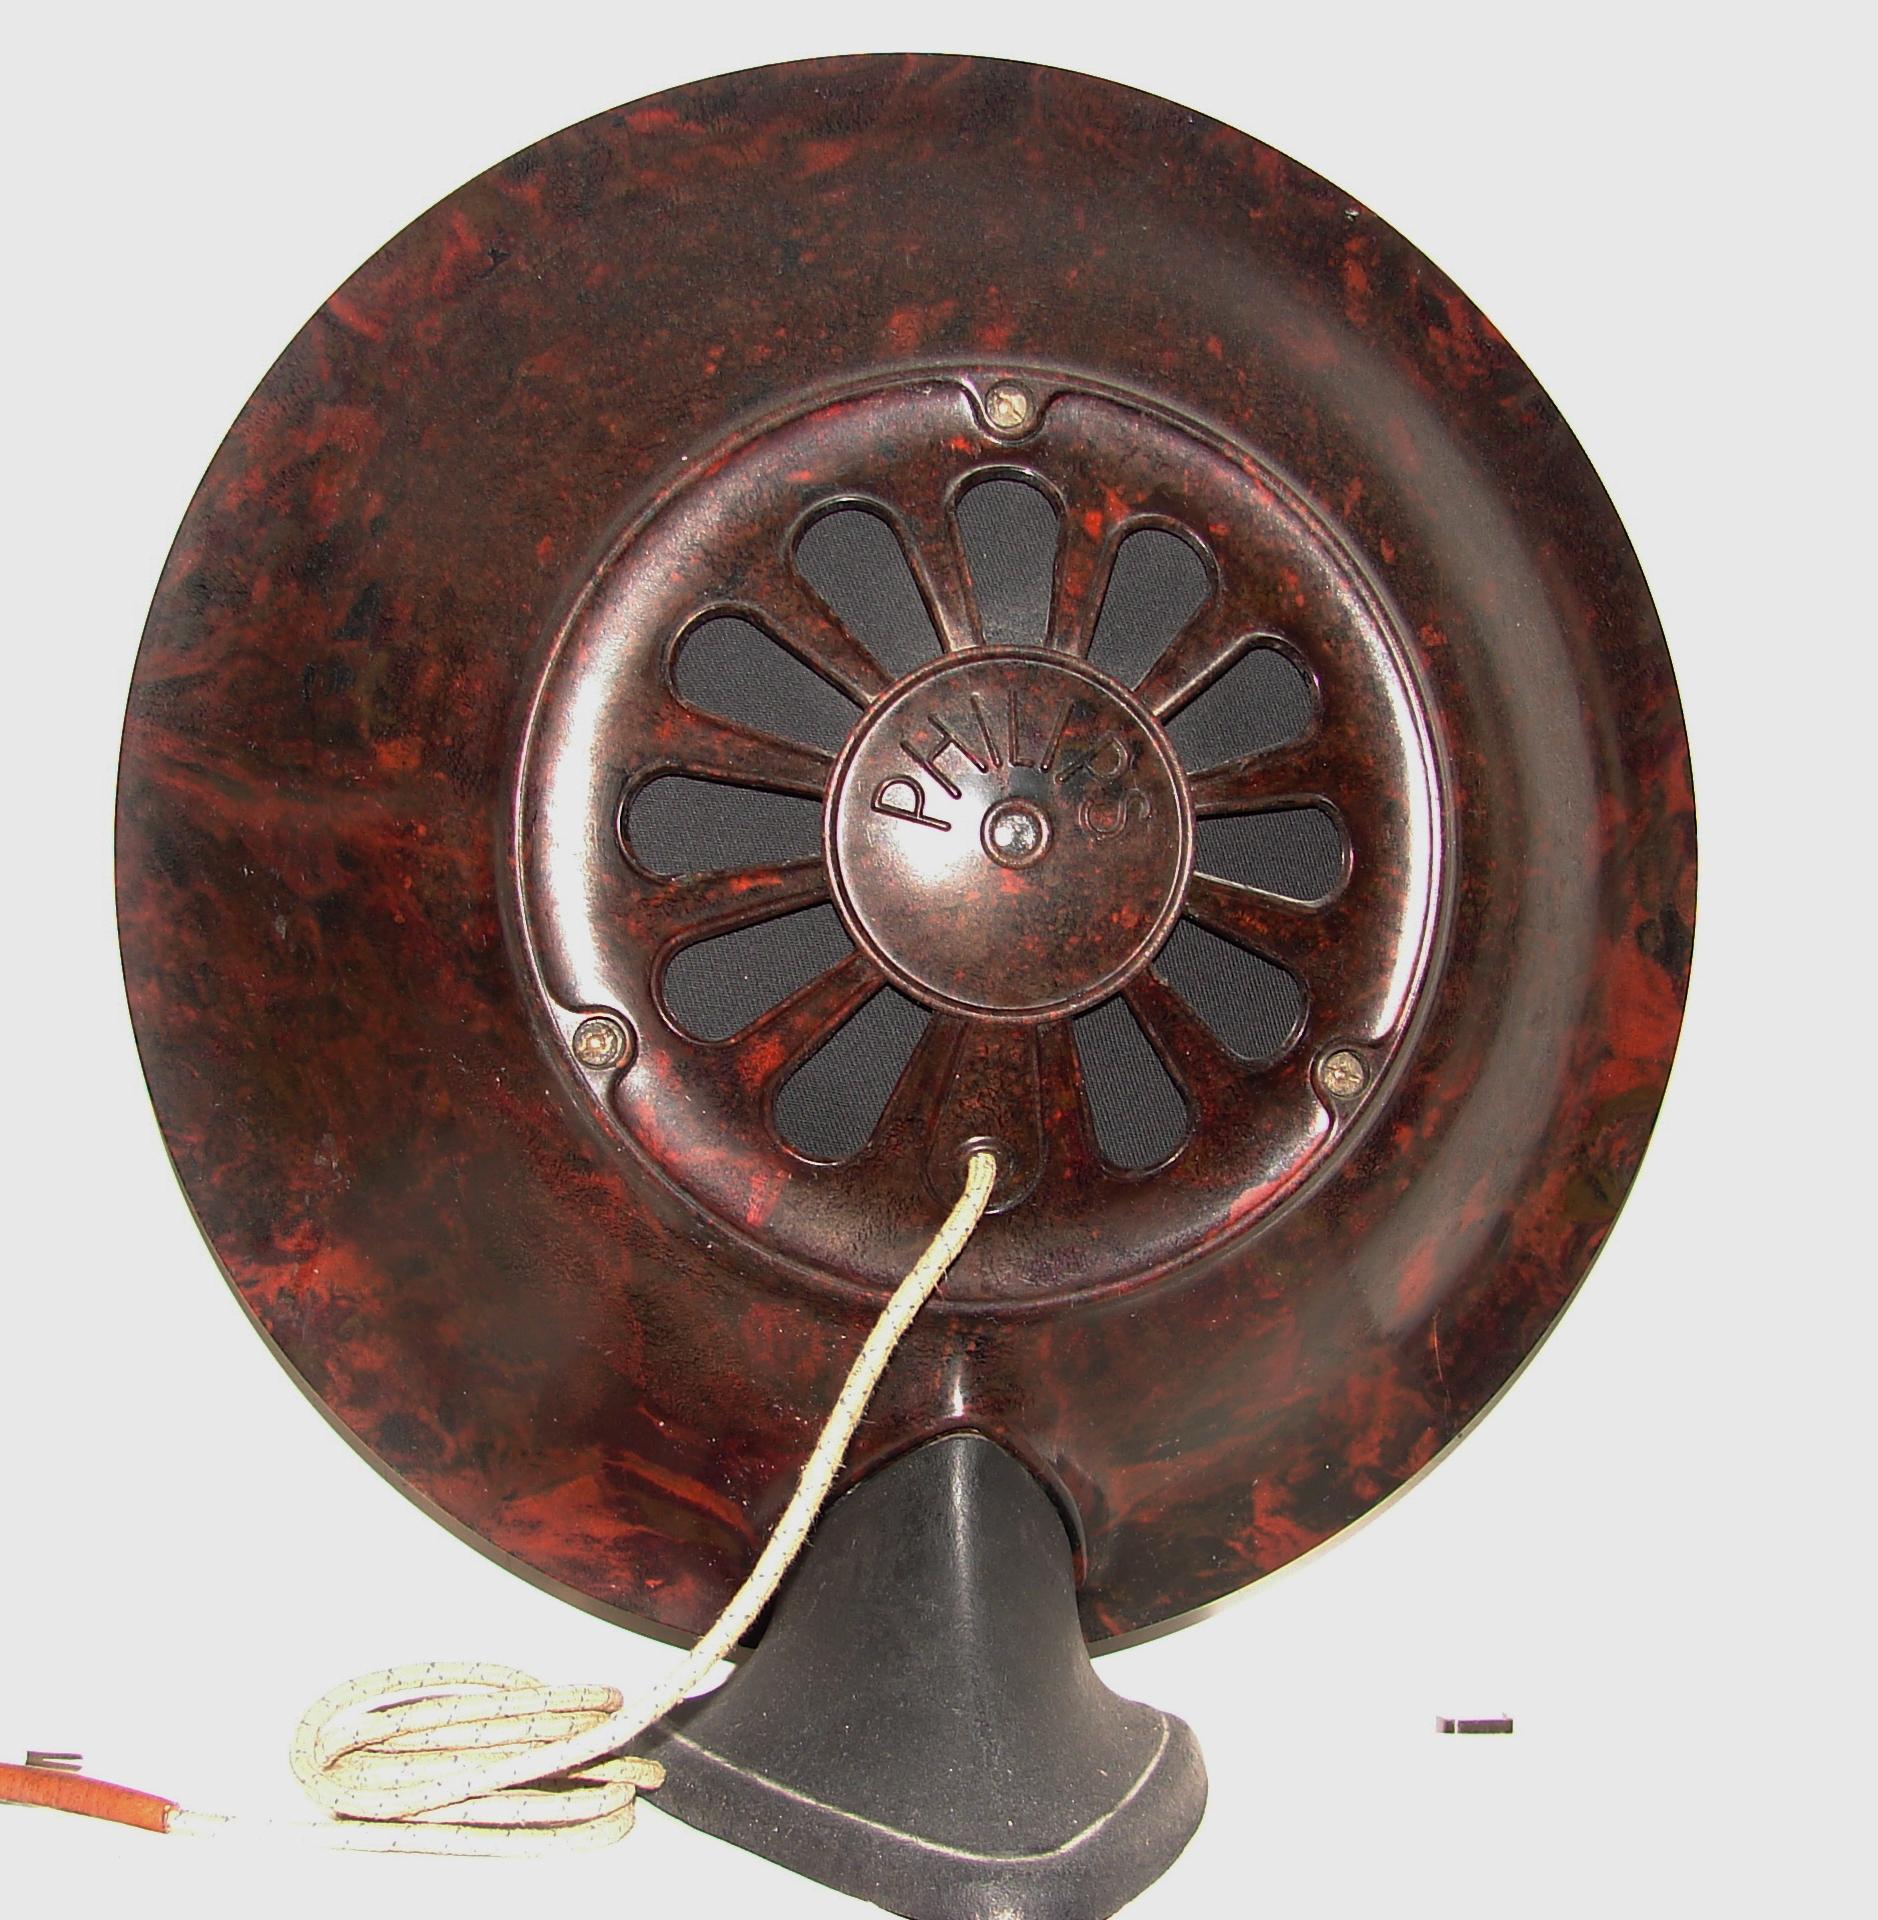 Hangszóró hátulról: Philips 2006.  1928